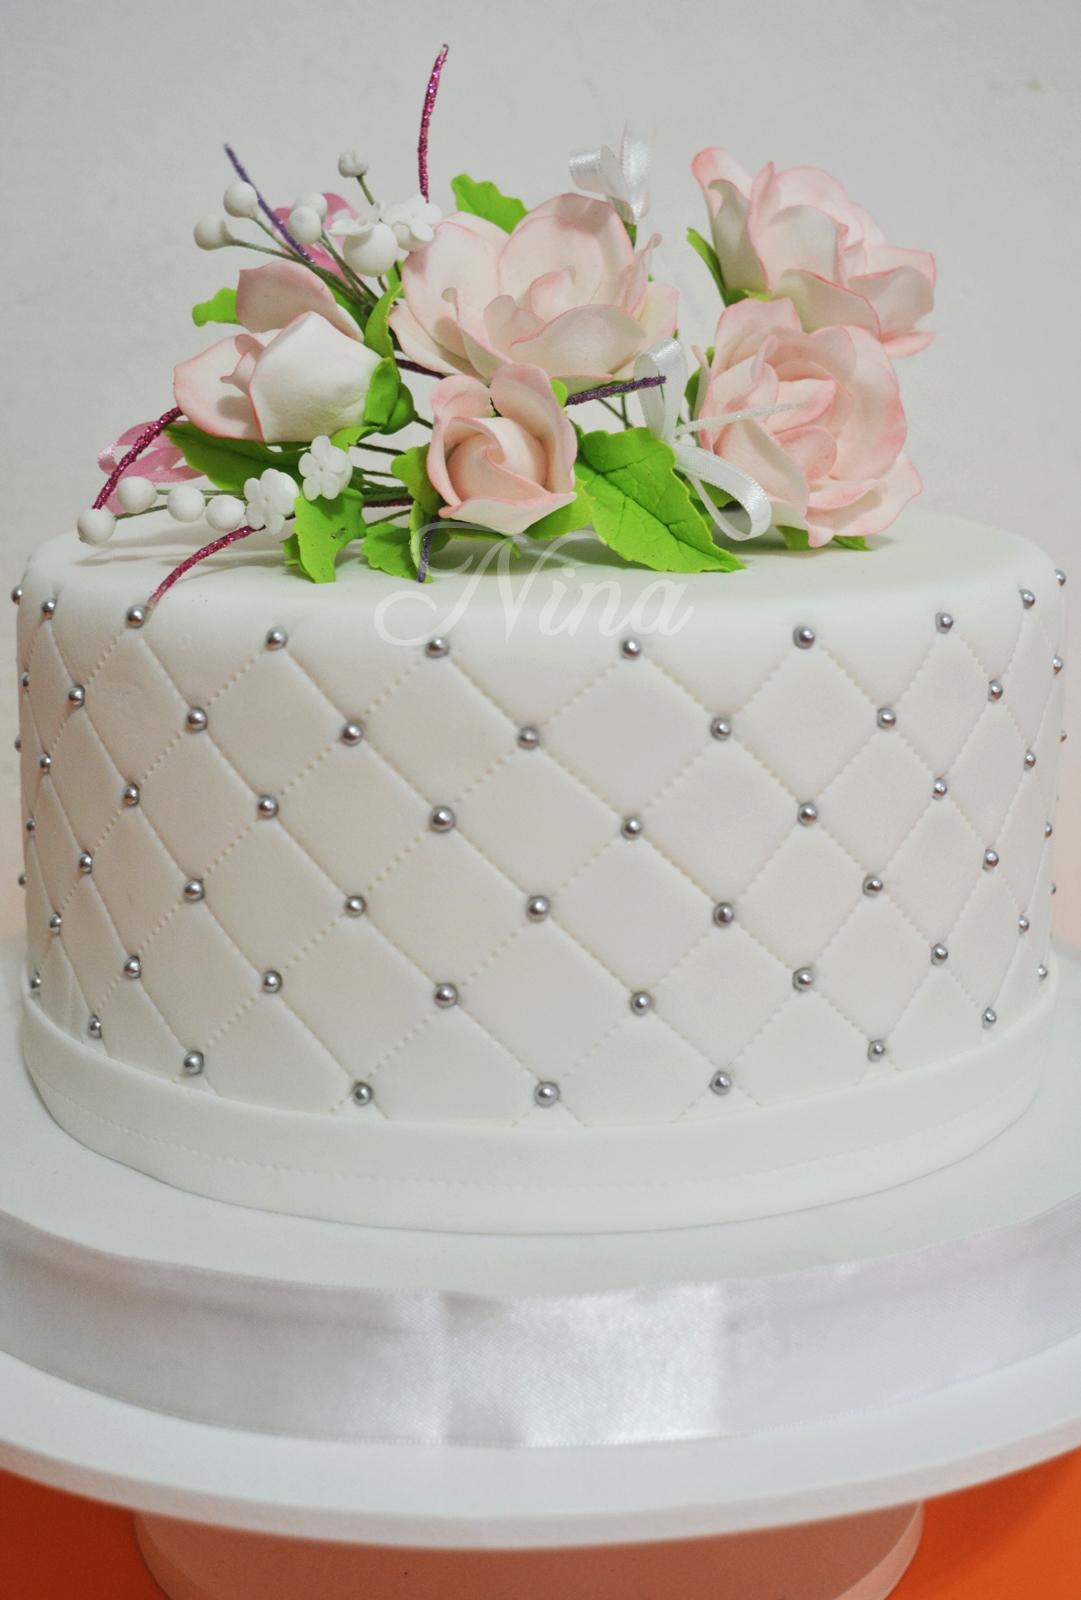 Nina dulce arte tecnica capitone decoracion de tortas for Tortas decoradas faciles